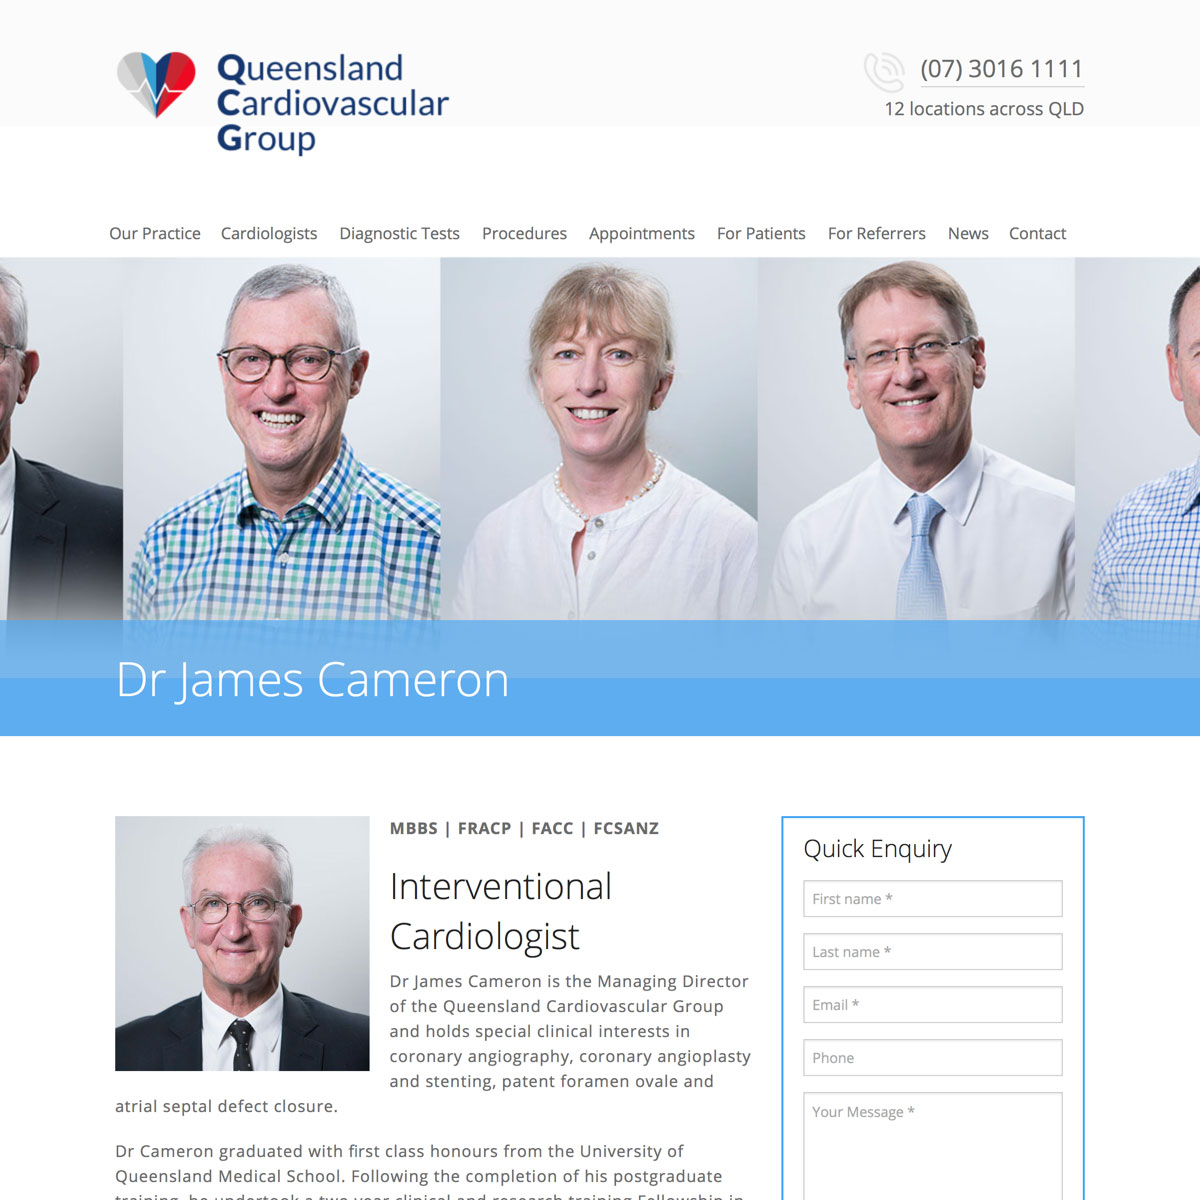 Queensland Cardiovascular Group - Cardiologist Bio